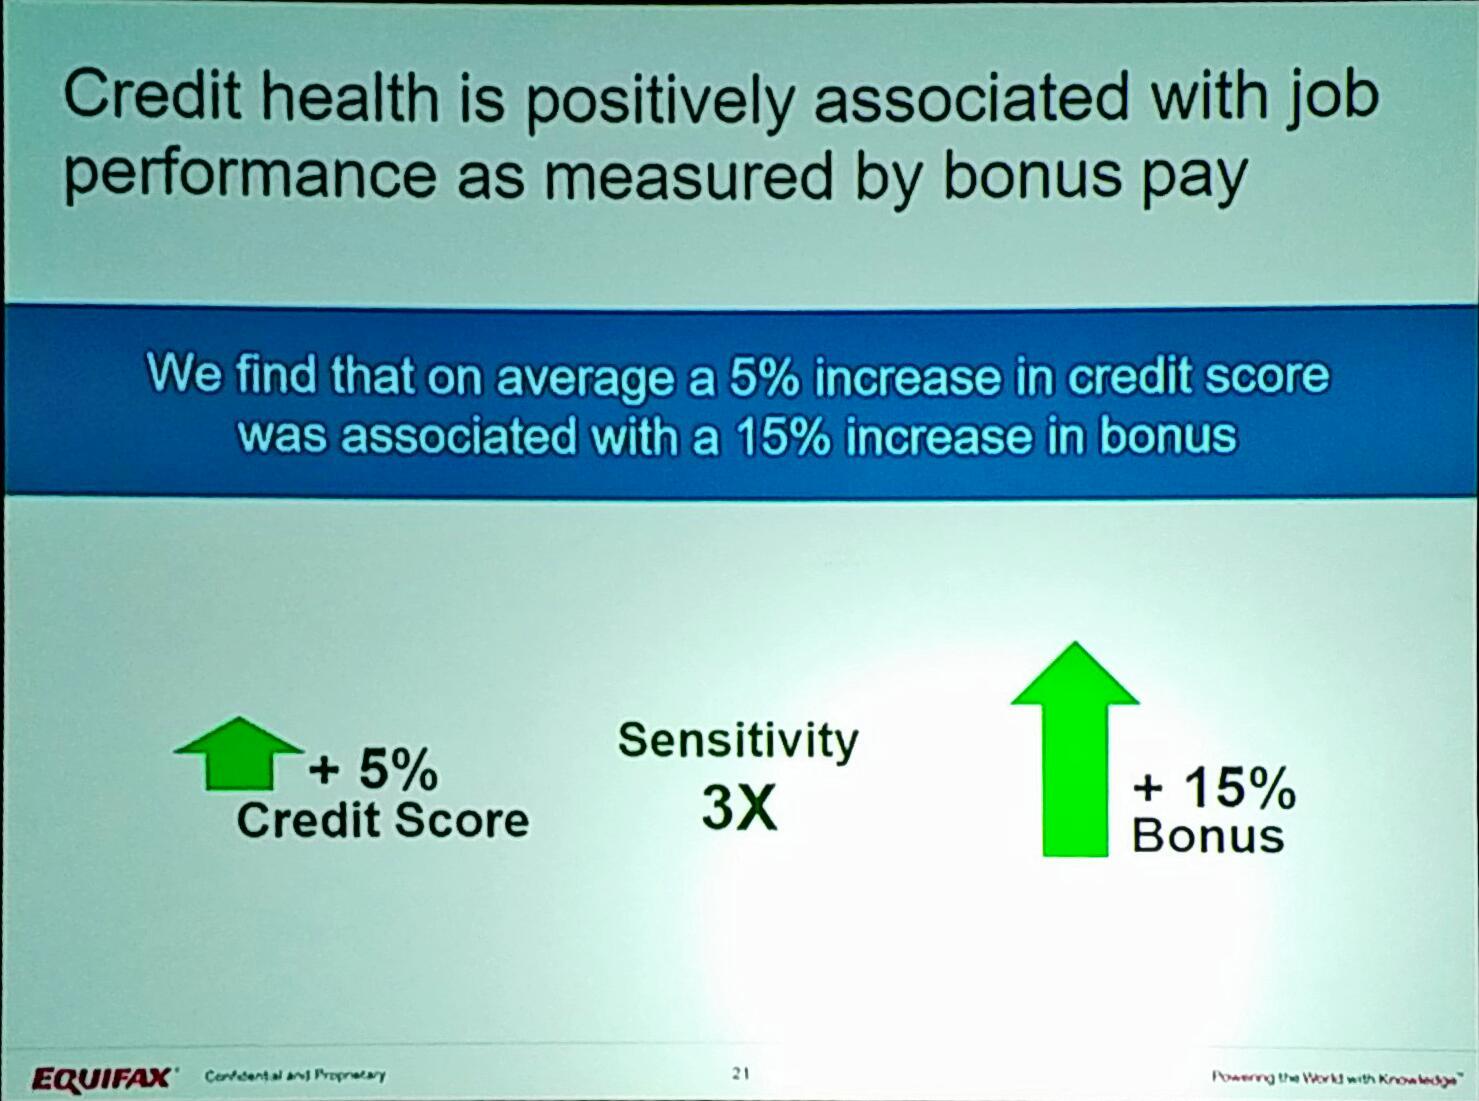 .@nhamdi - 5% increase jn credit score associate to a 15% increase in bonus. #EFXForum17 https://t.co/cgjY1Ufz7d